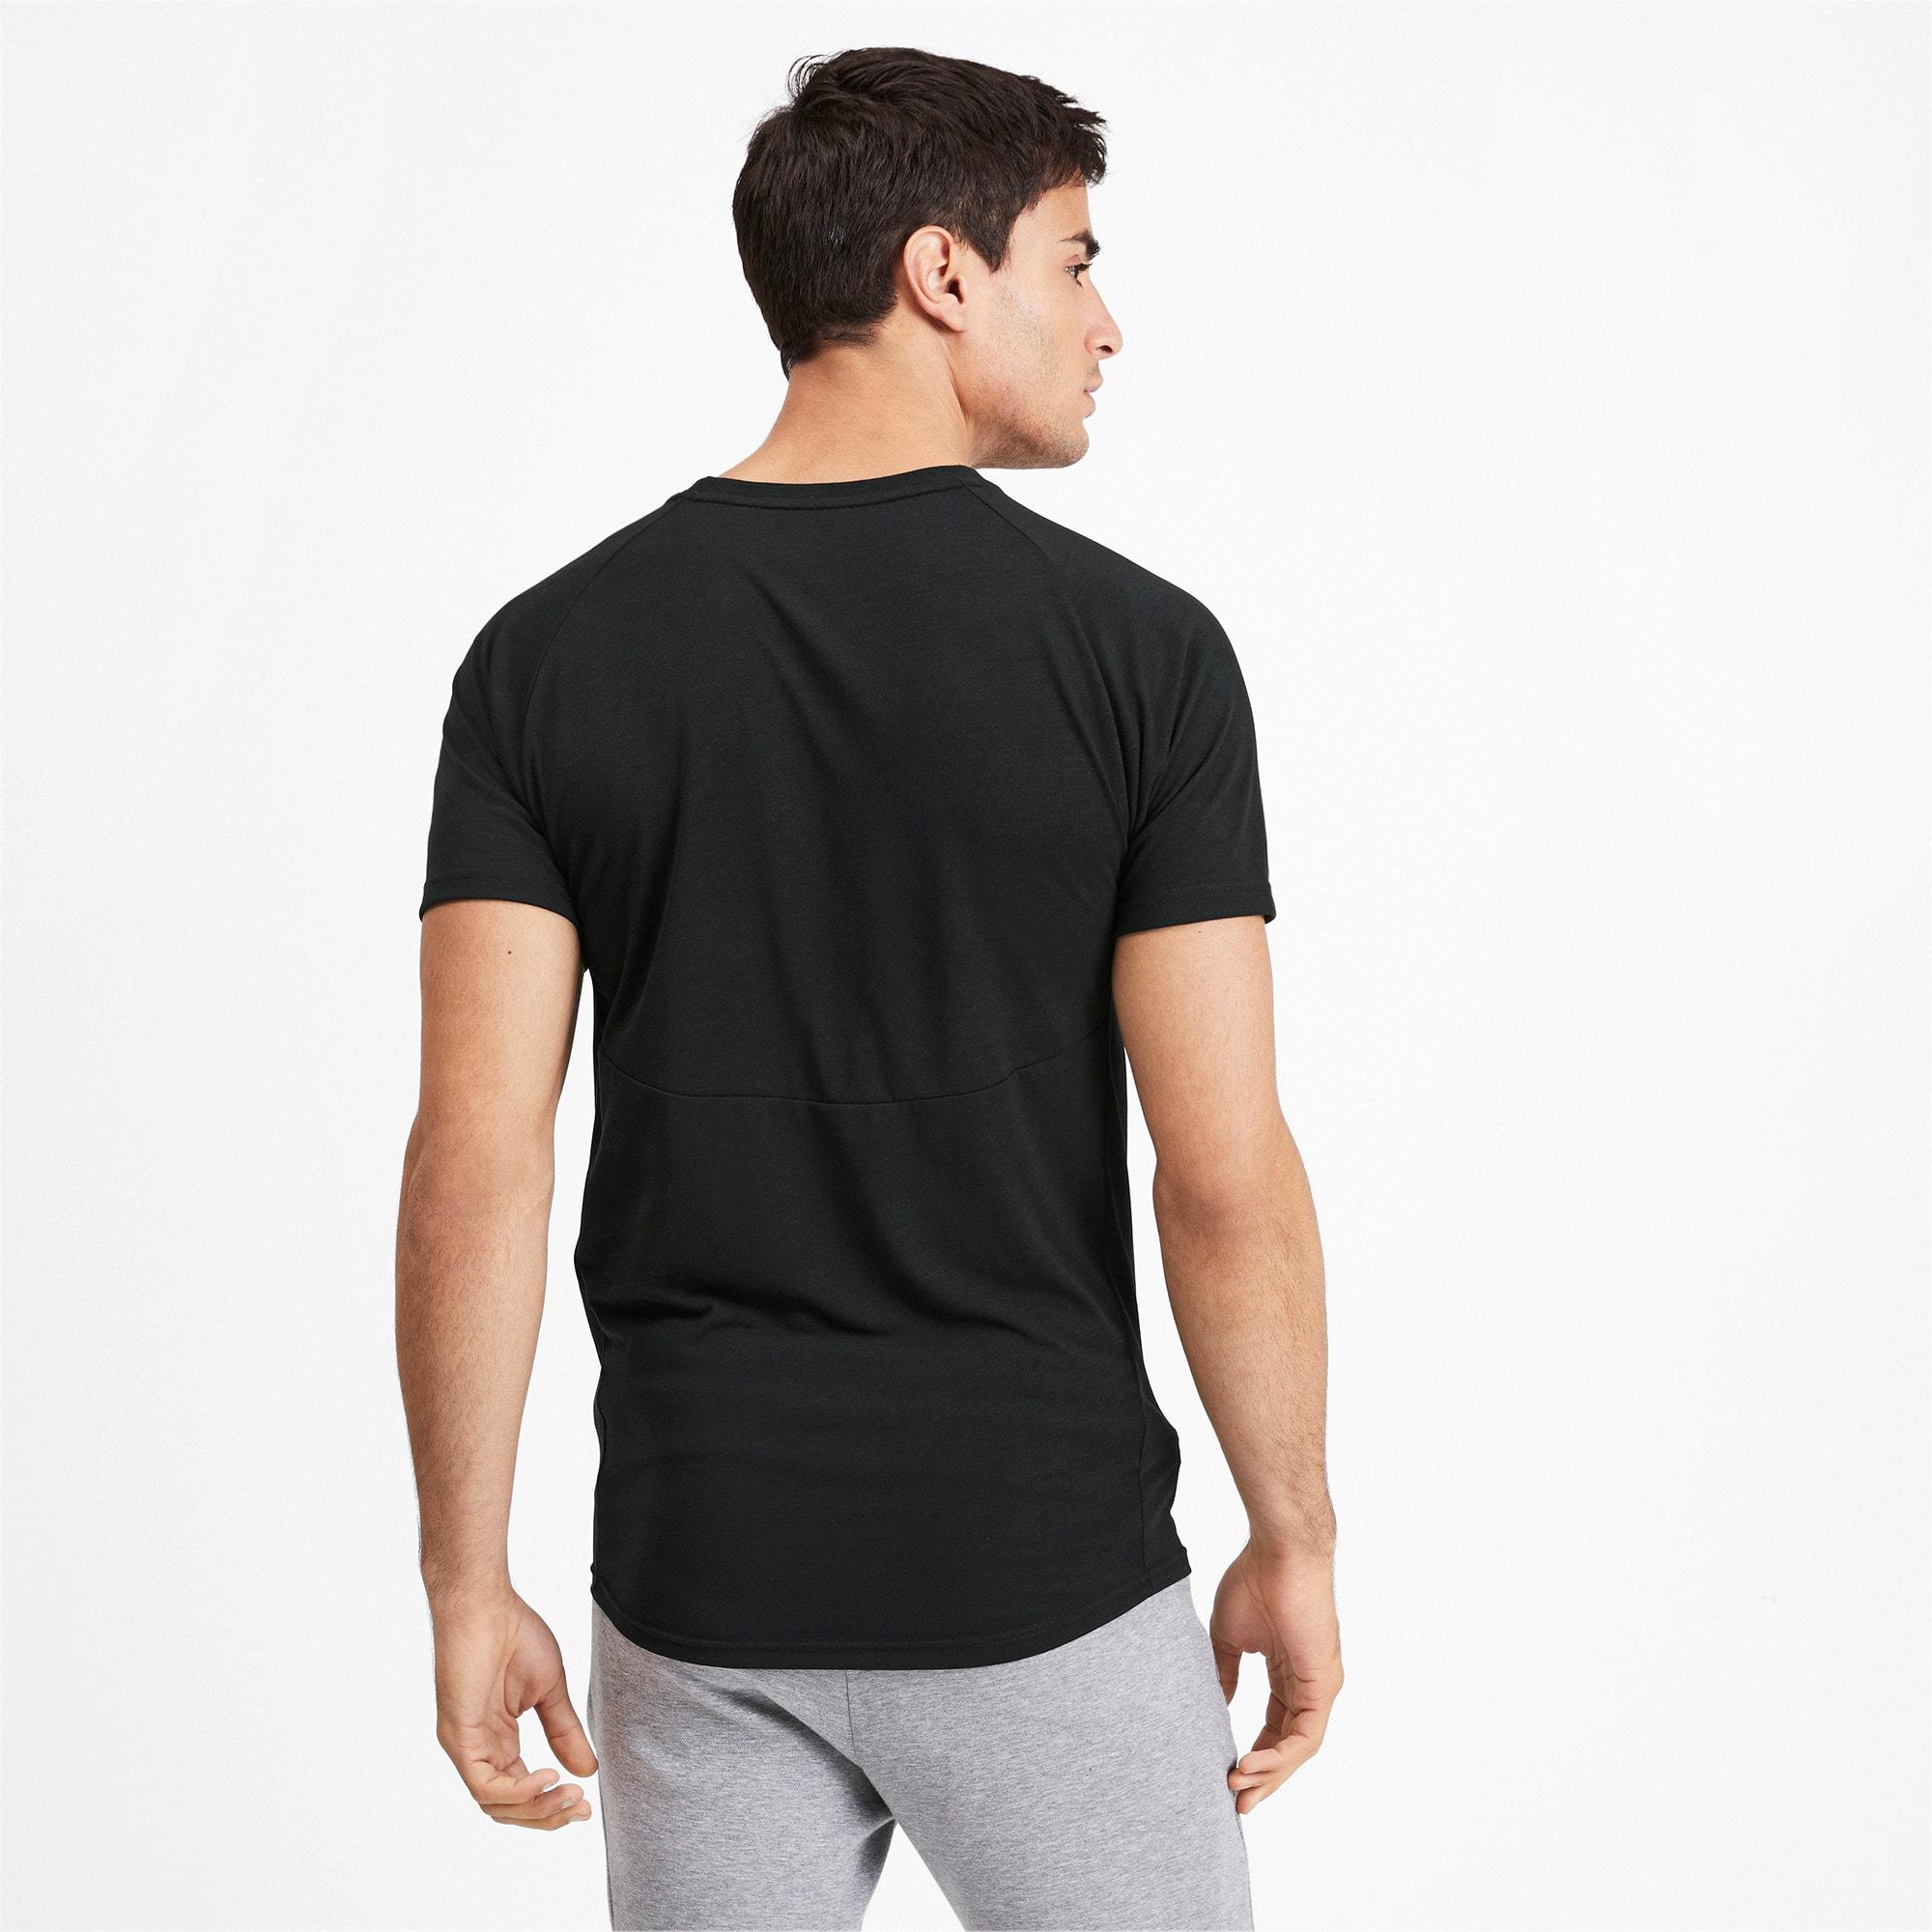 Thumbnail 2 of Meska koszulka z krótkim rekawem Evostripe, Puma Black, medium